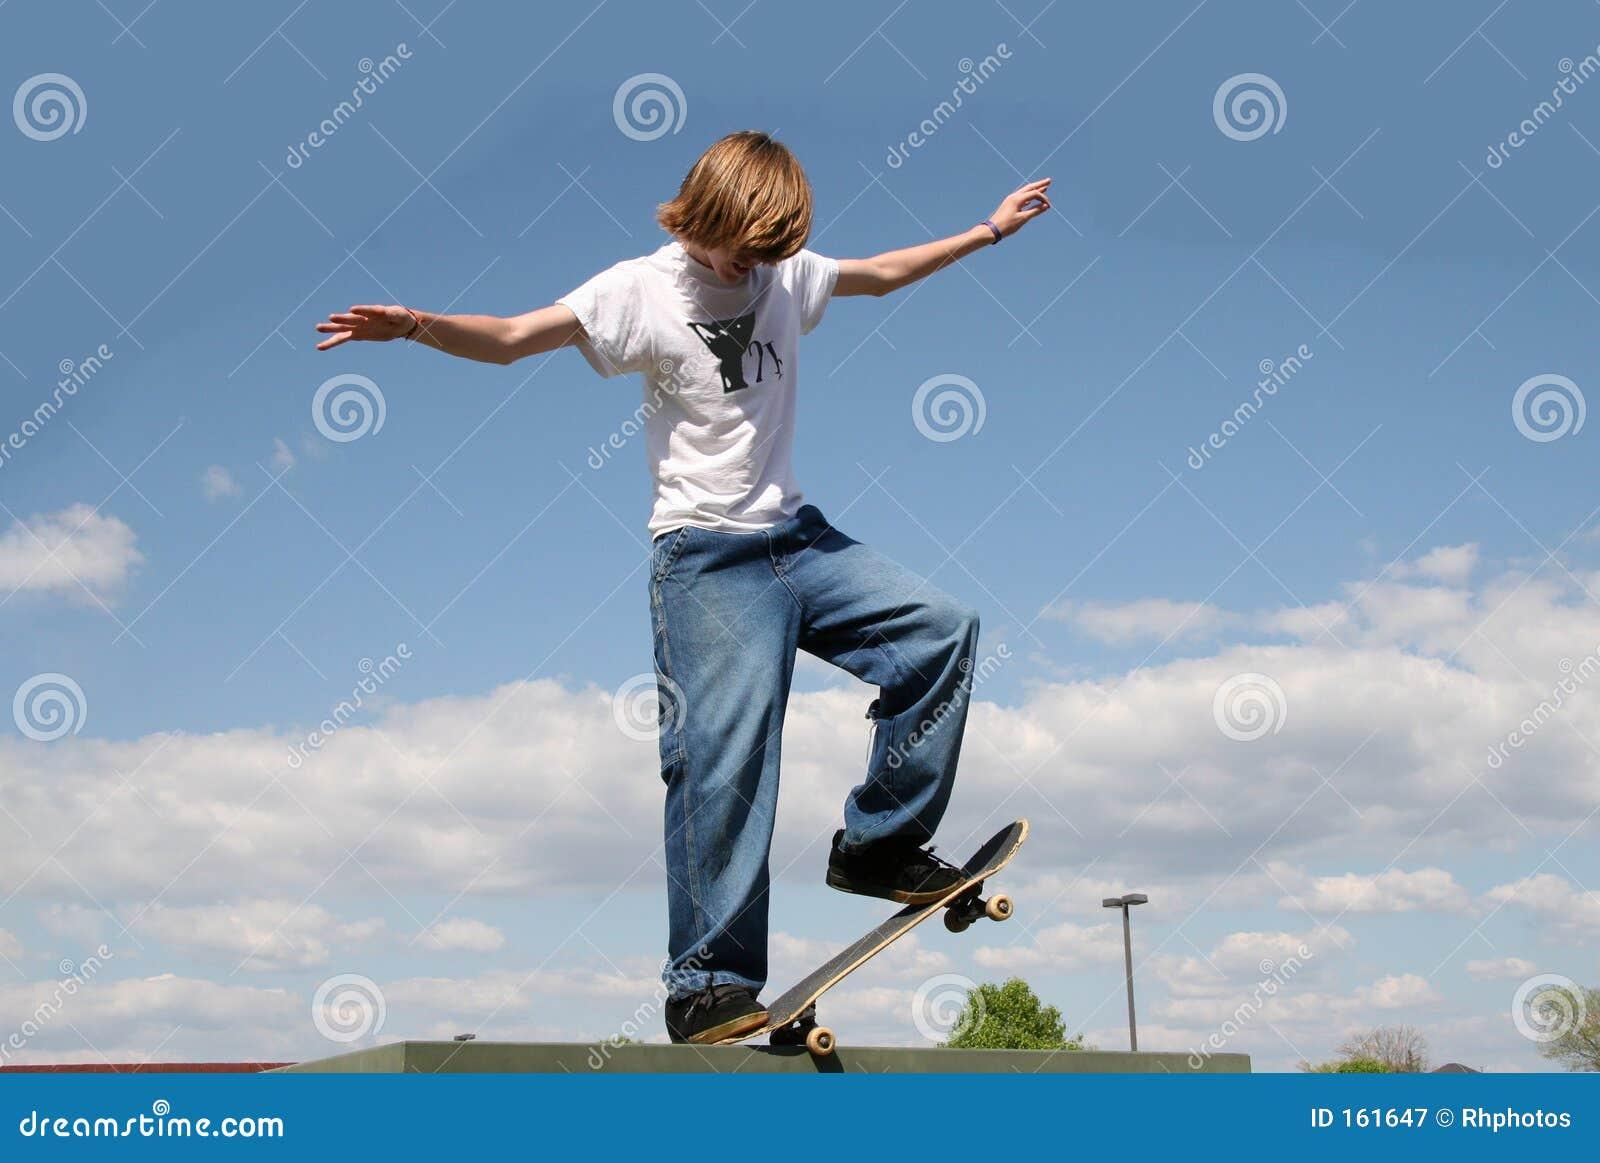 Skateboarder in Clouds